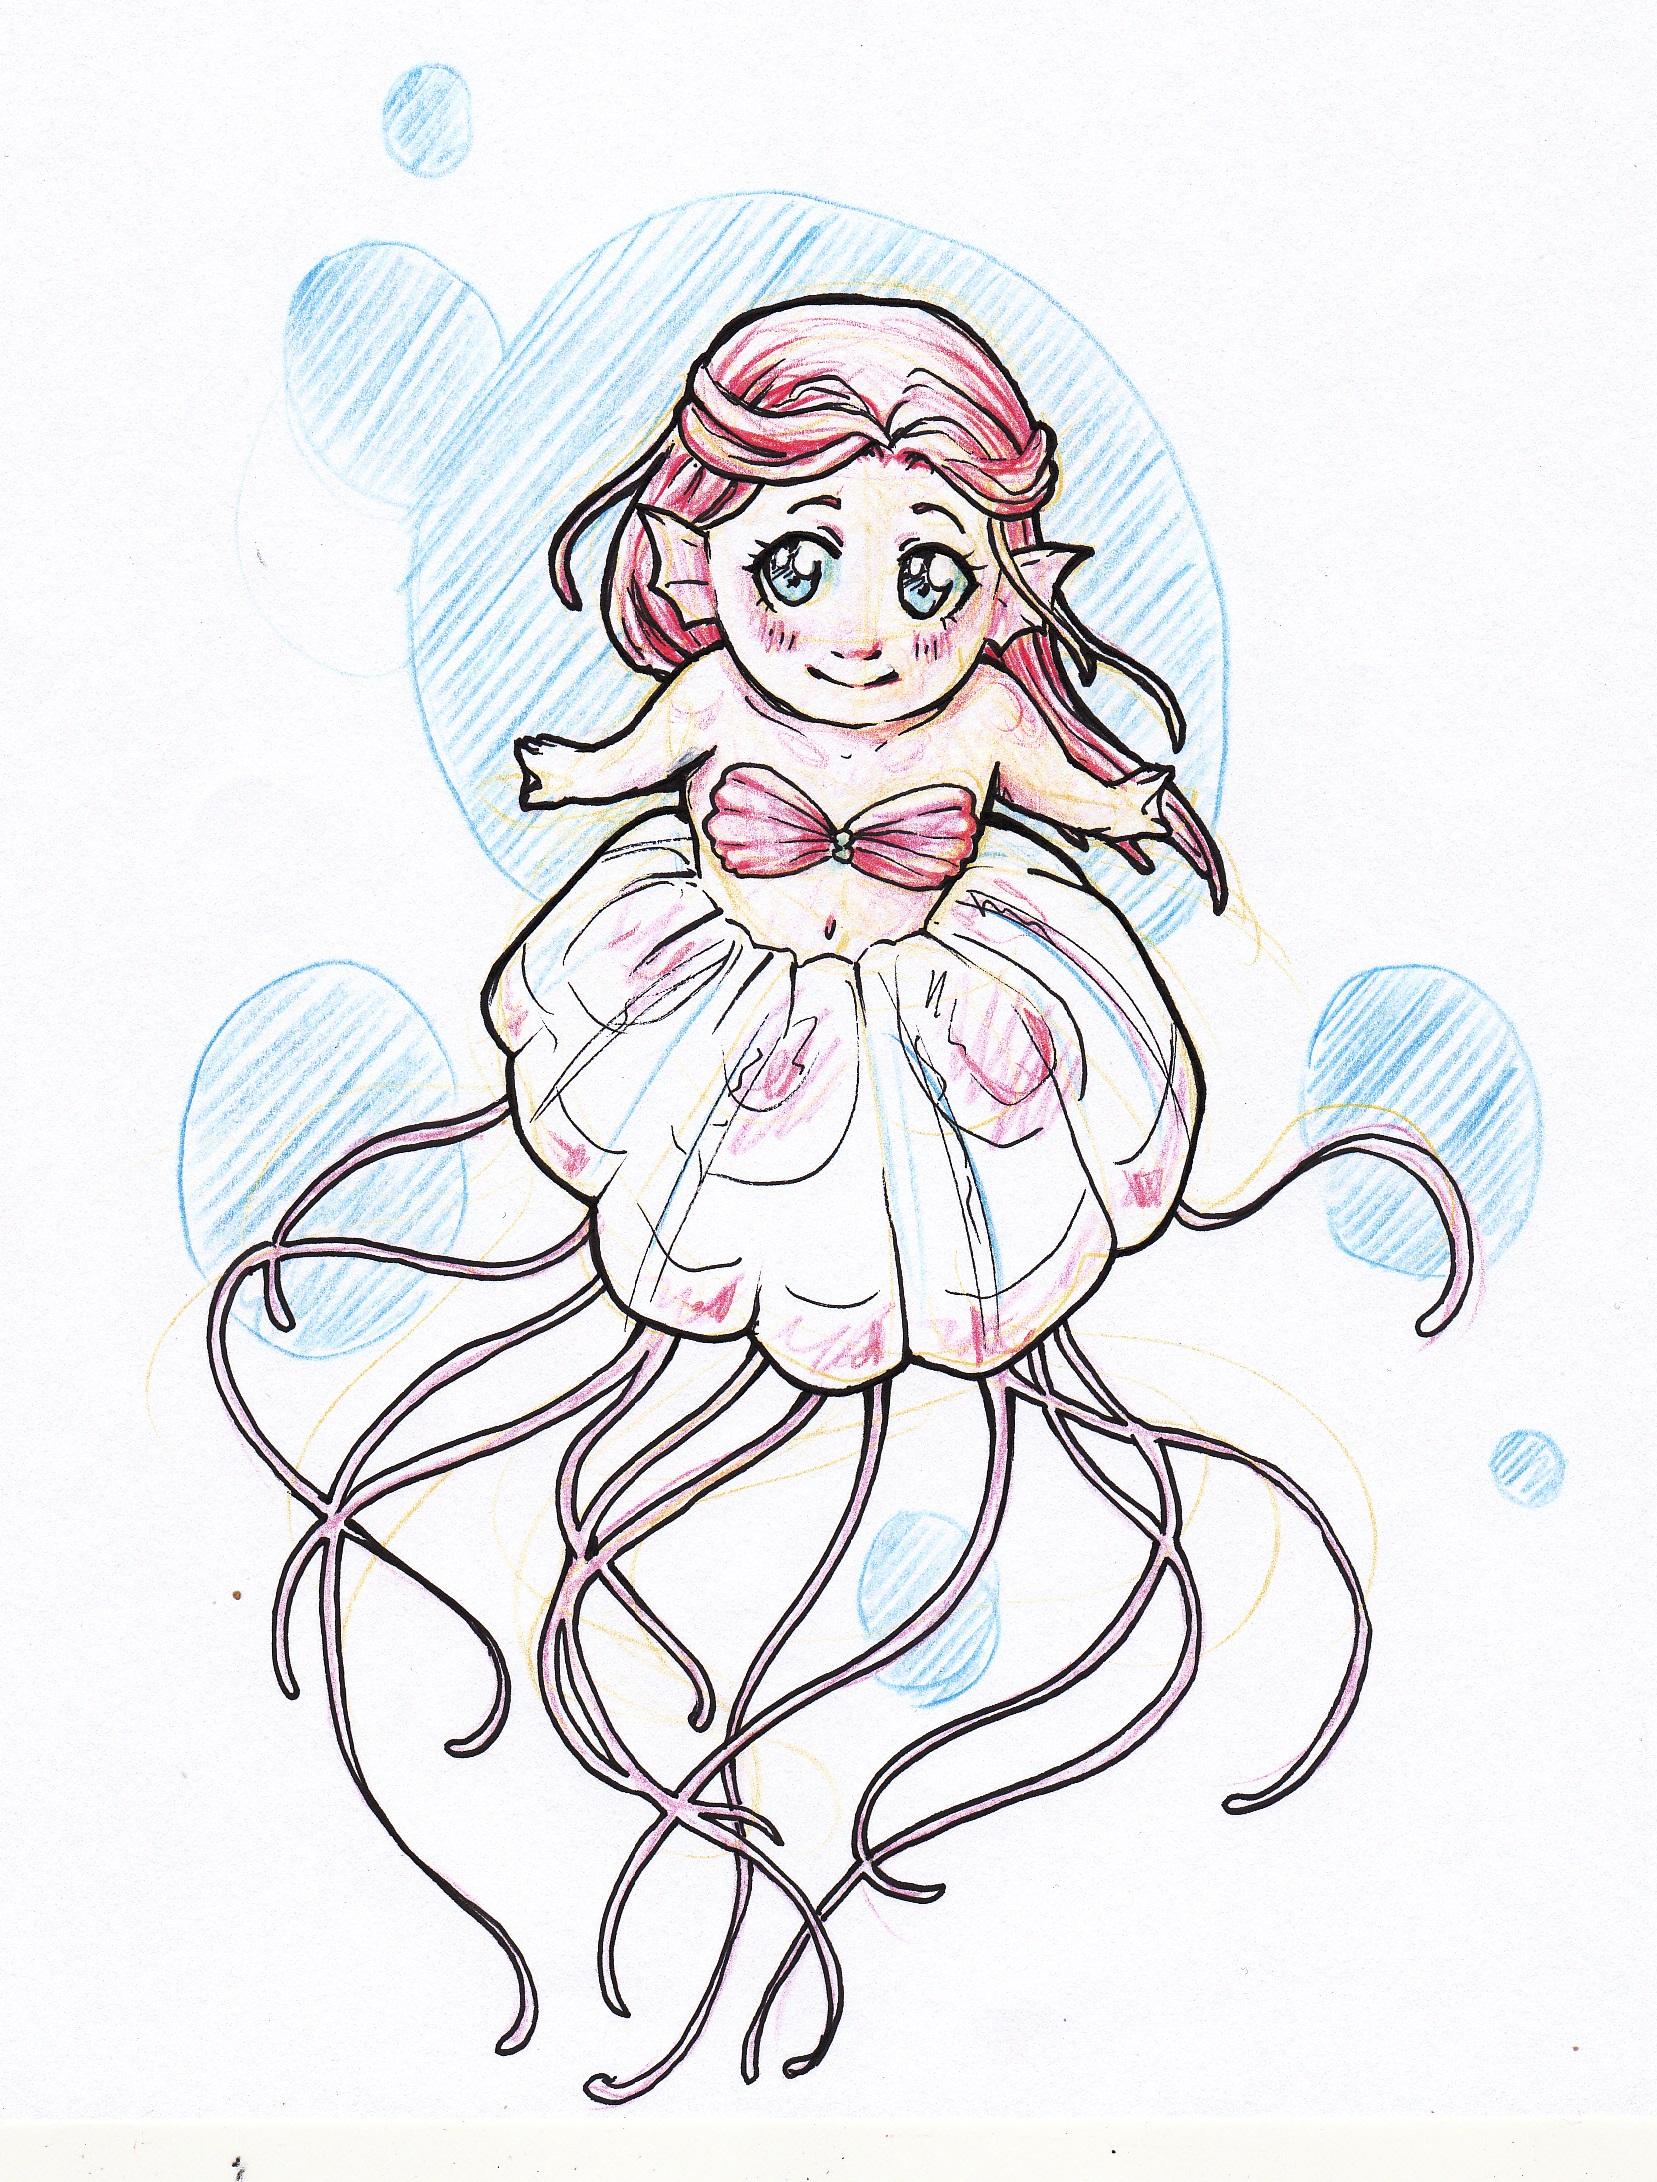 Jellygirl